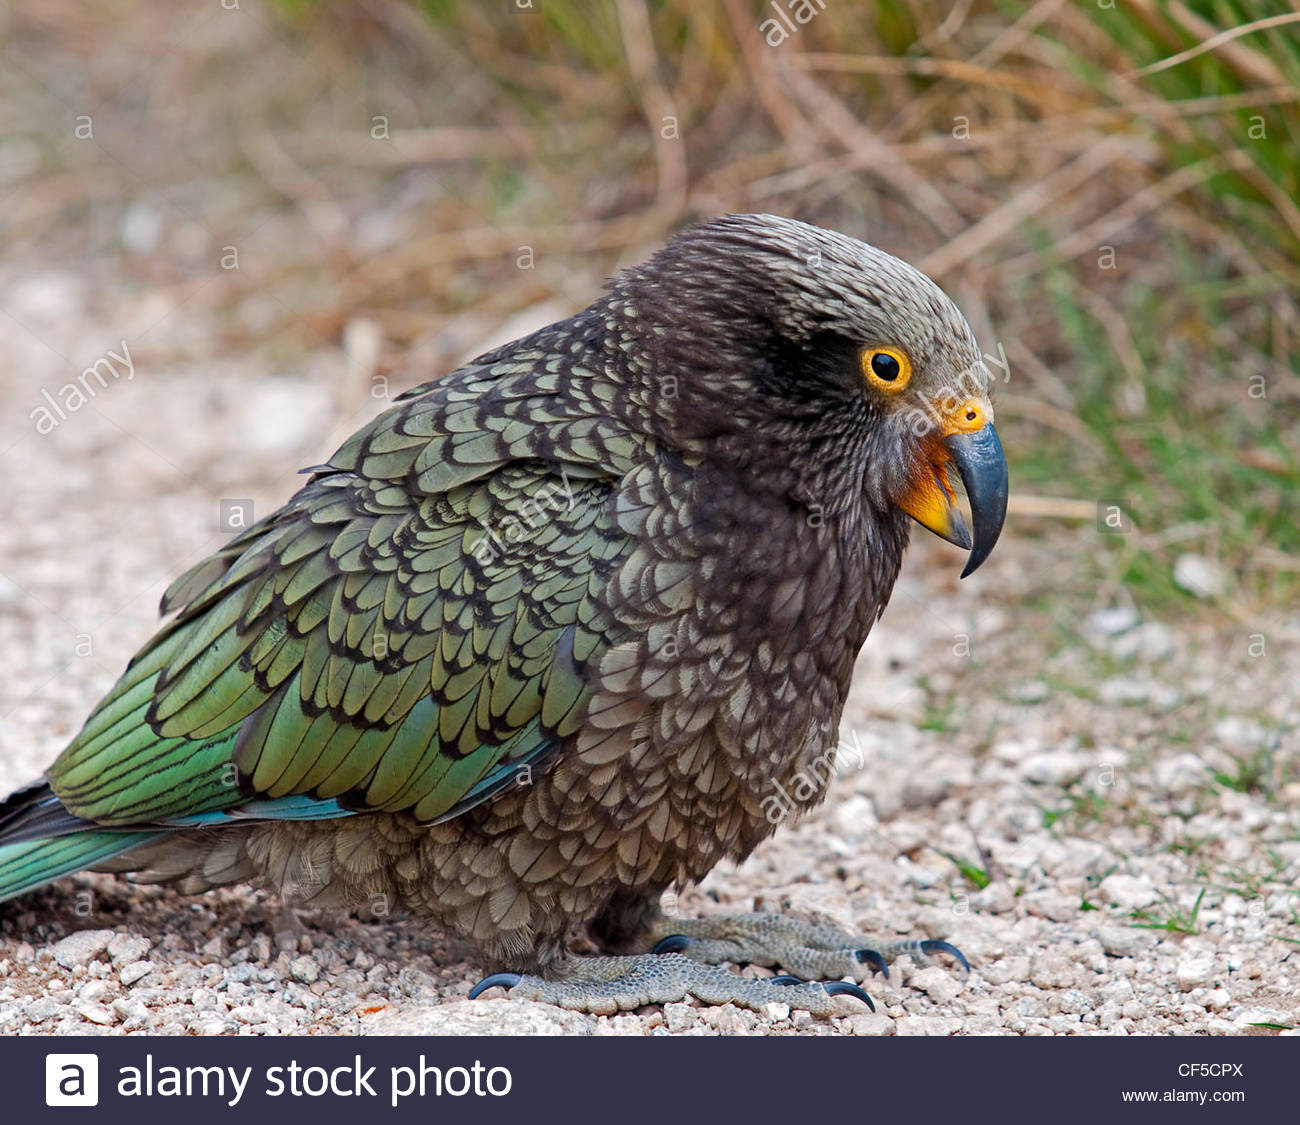 kea papagei finden sie in neuseeland stockfoto bild 43760386 alamy. Black Bedroom Furniture Sets. Home Design Ideas